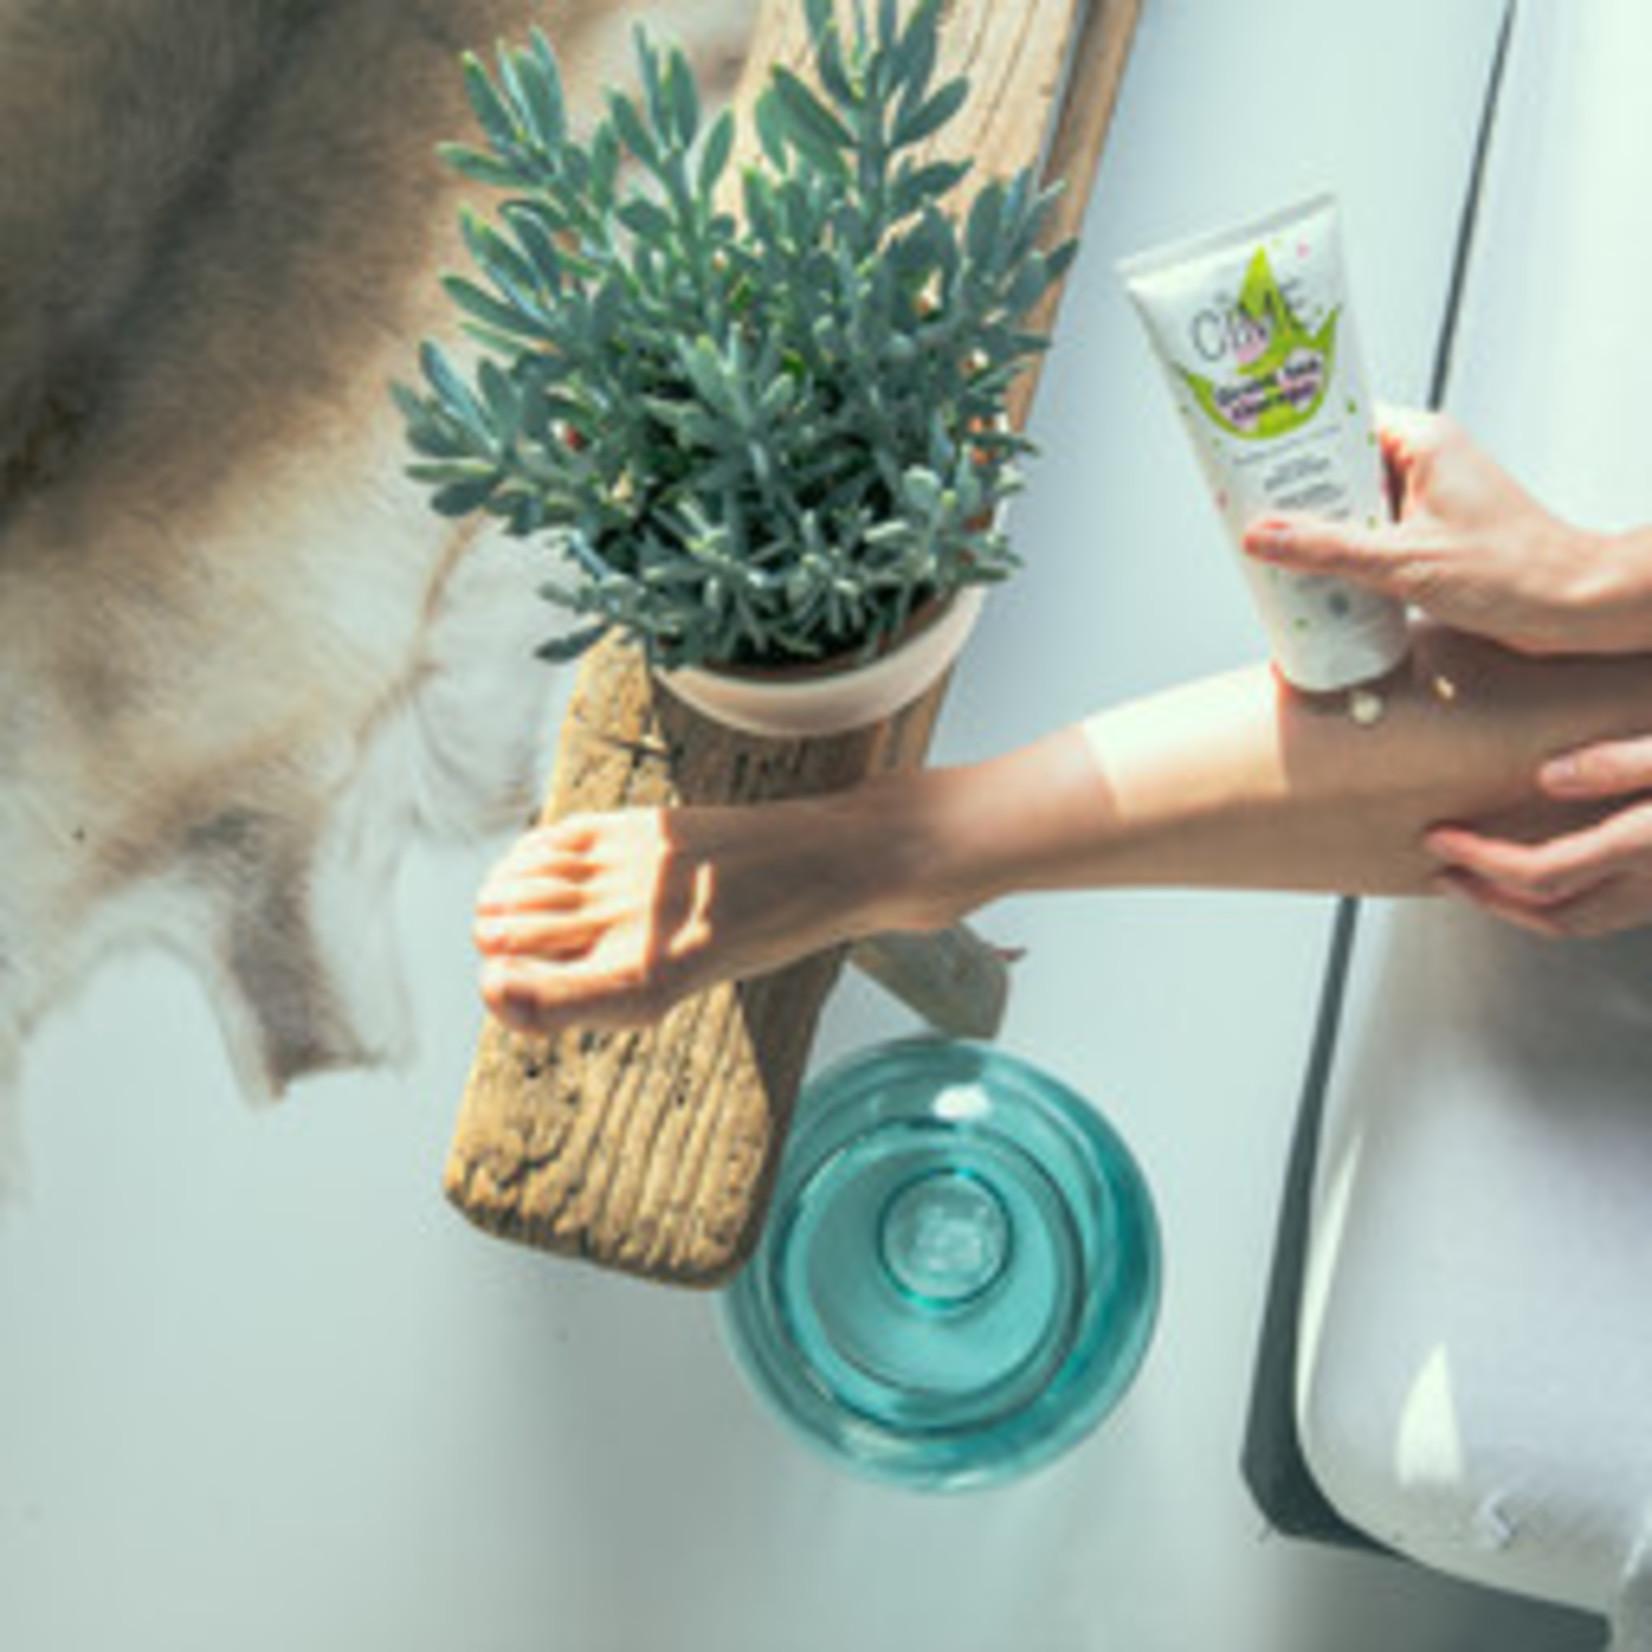 Verstevigende bodylotion - Green tea therapy - Cîme